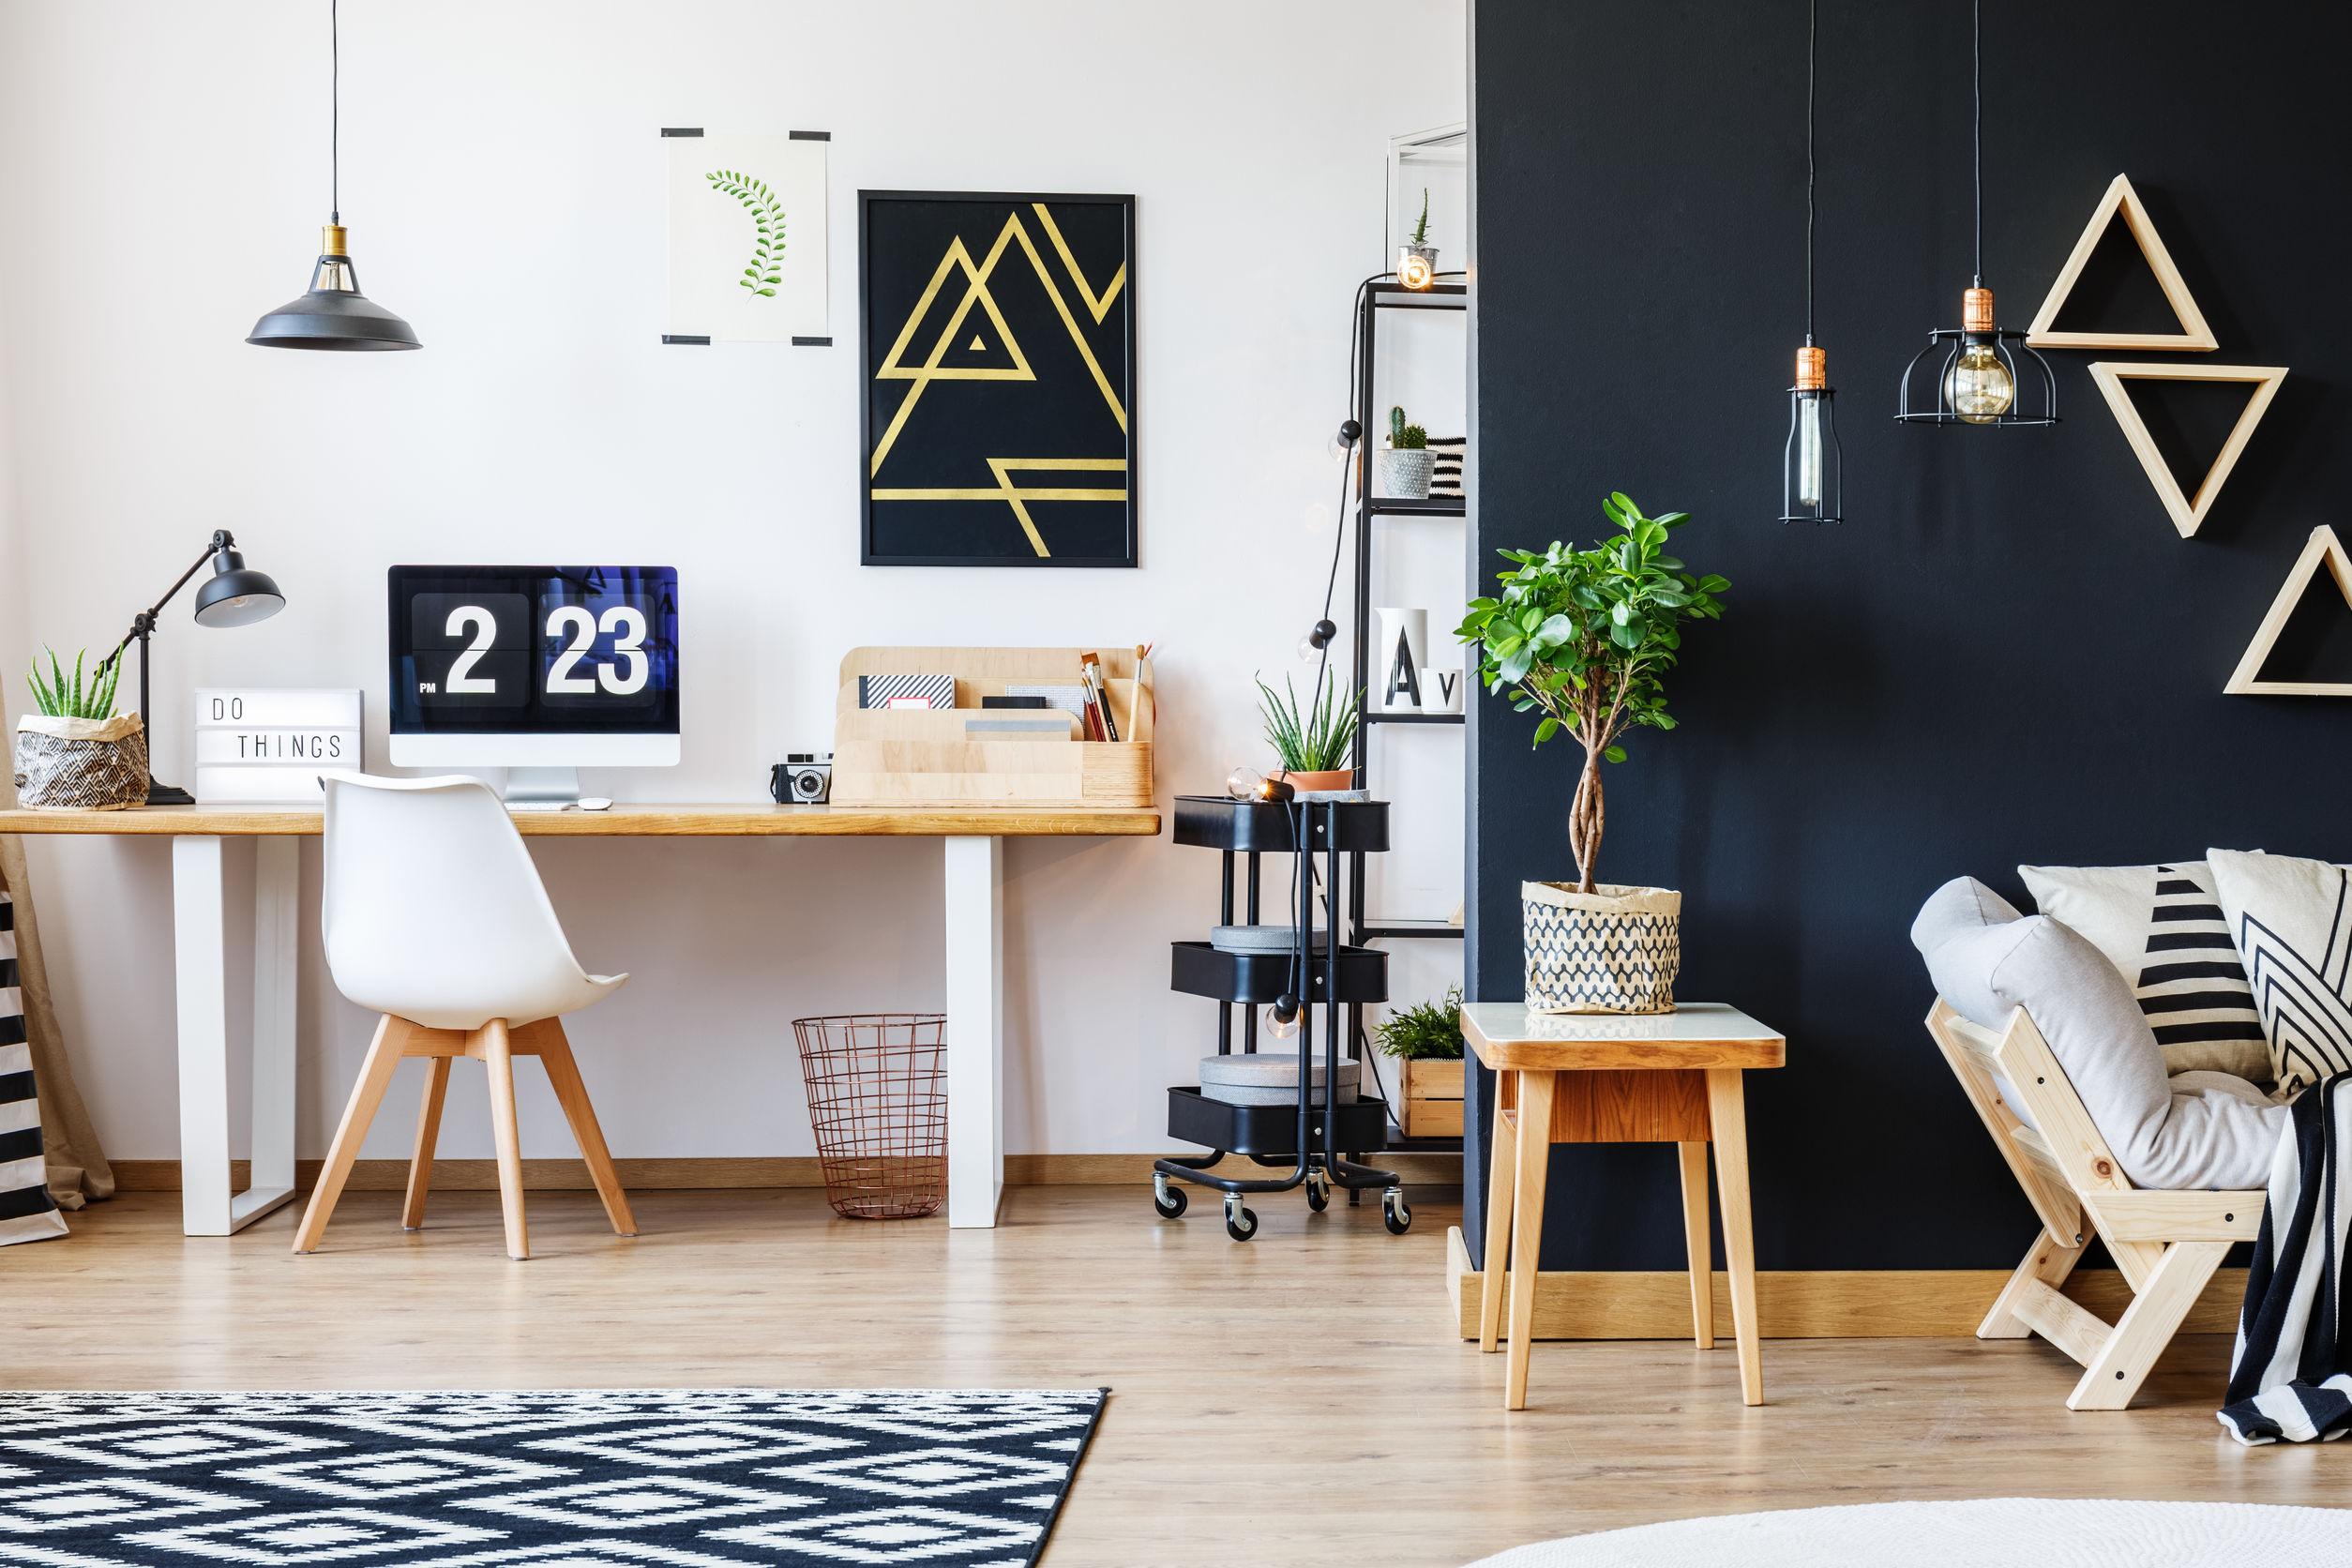 Stylish open studio for freelancer